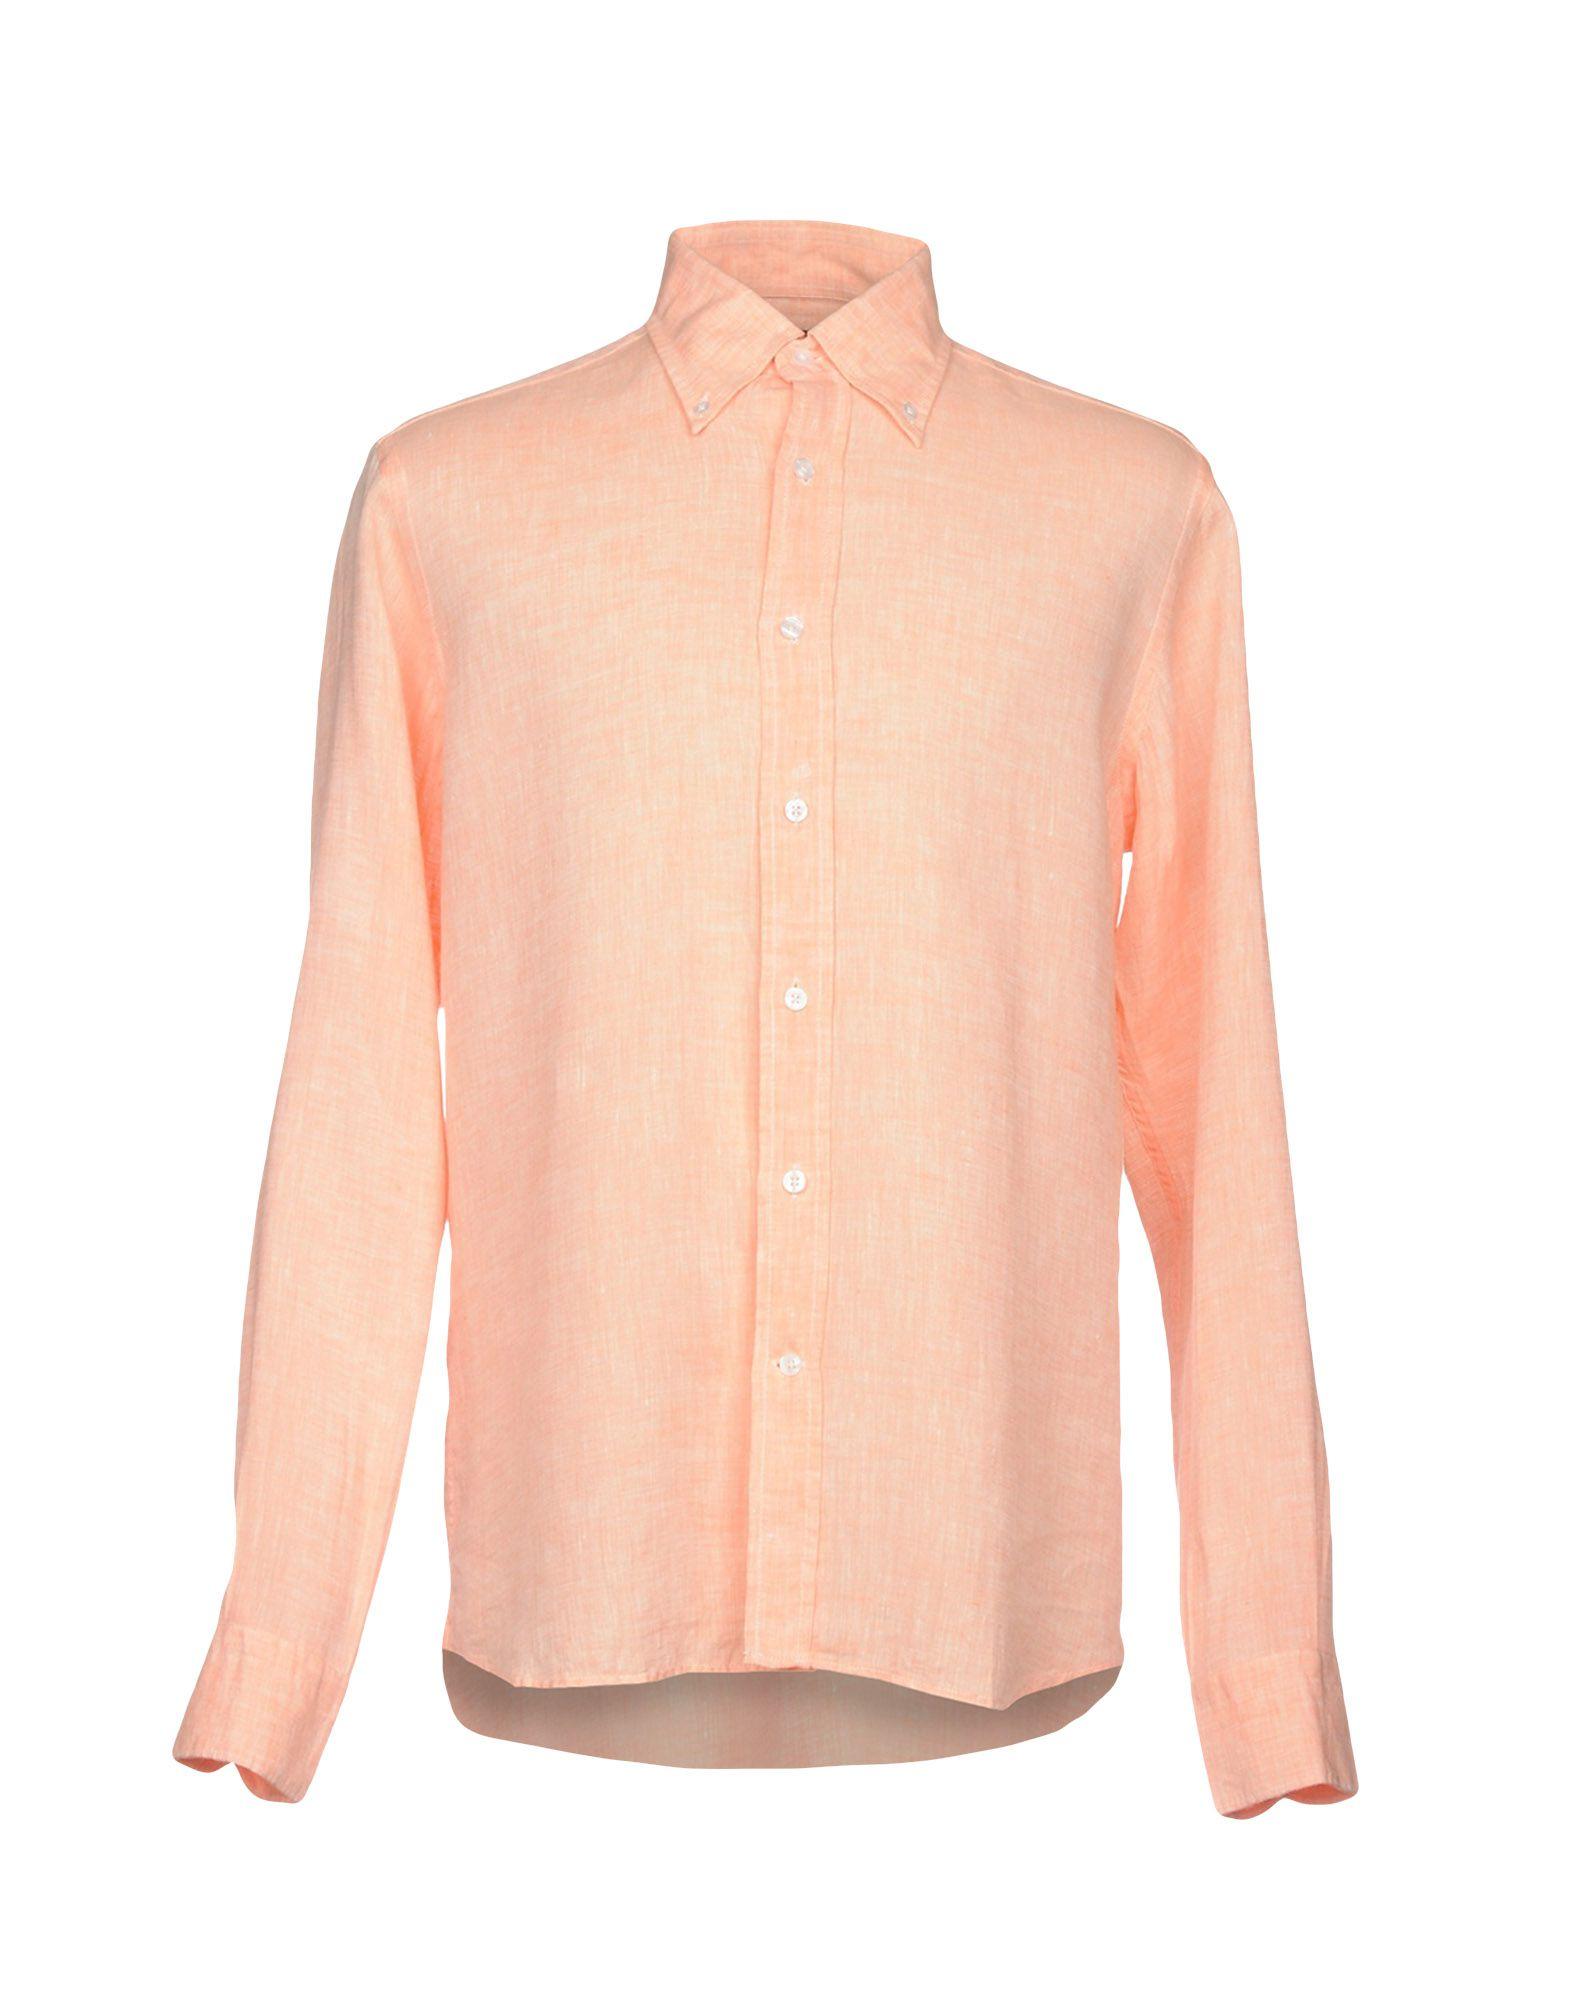 Sartorio Shirts Salmon Pink Modesens